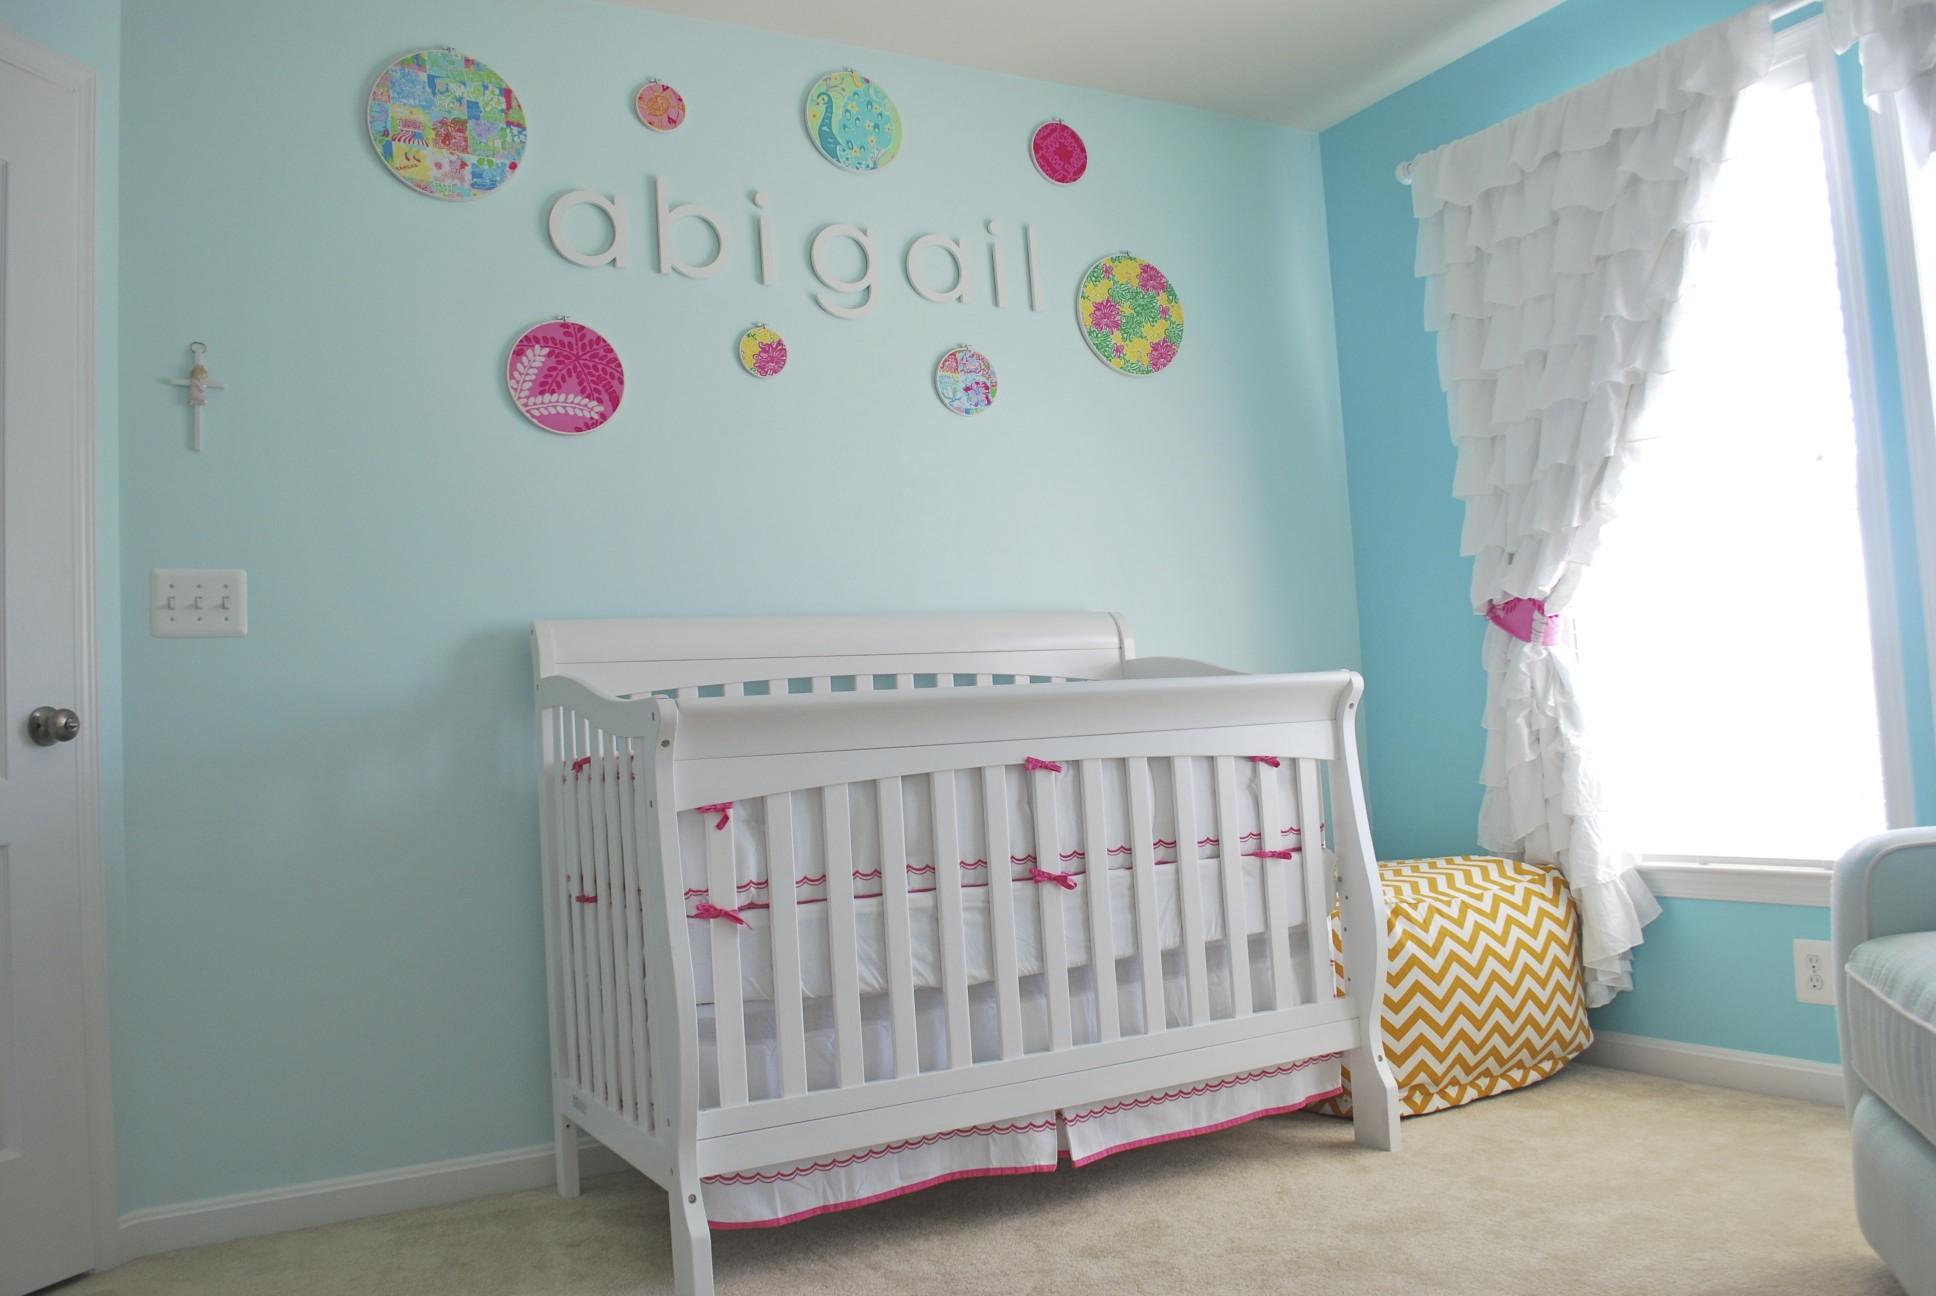 blog dorm flamingo bedding lilly pulitzer ur makeover img decor door bed